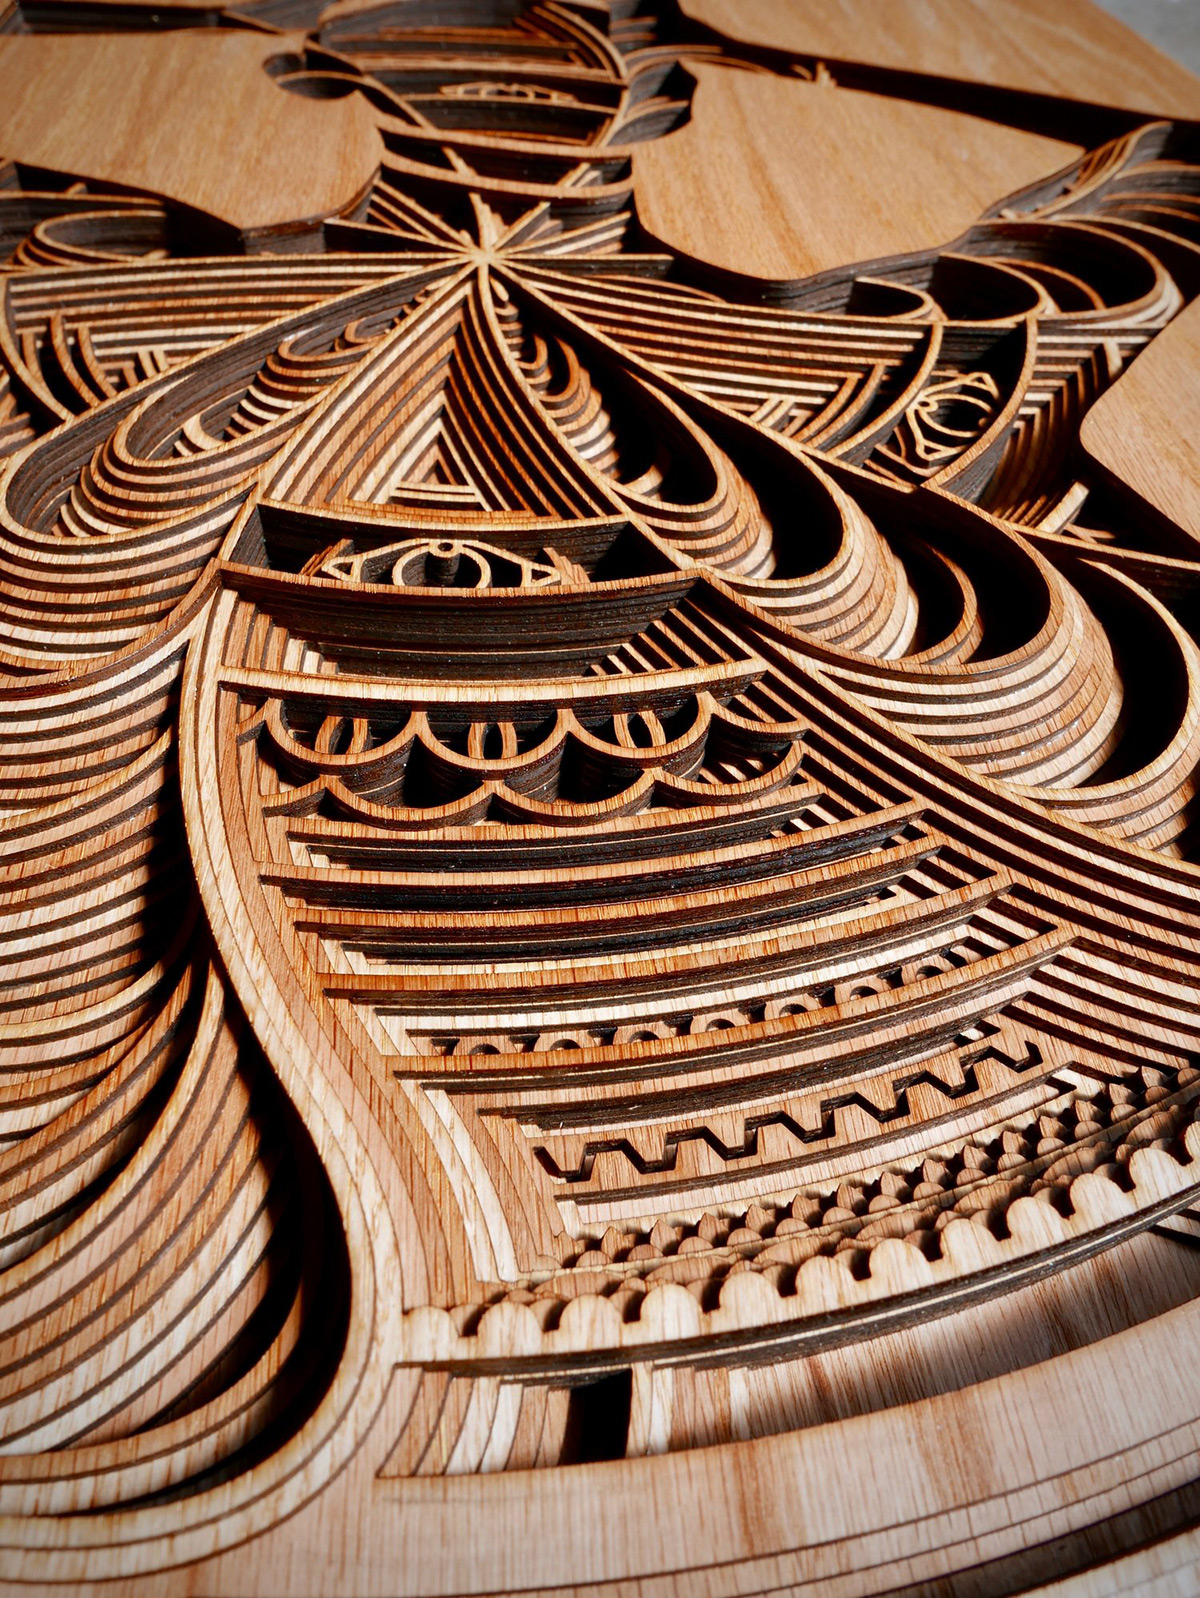 Mesmerizing Laser Cut Wooden Sculptures